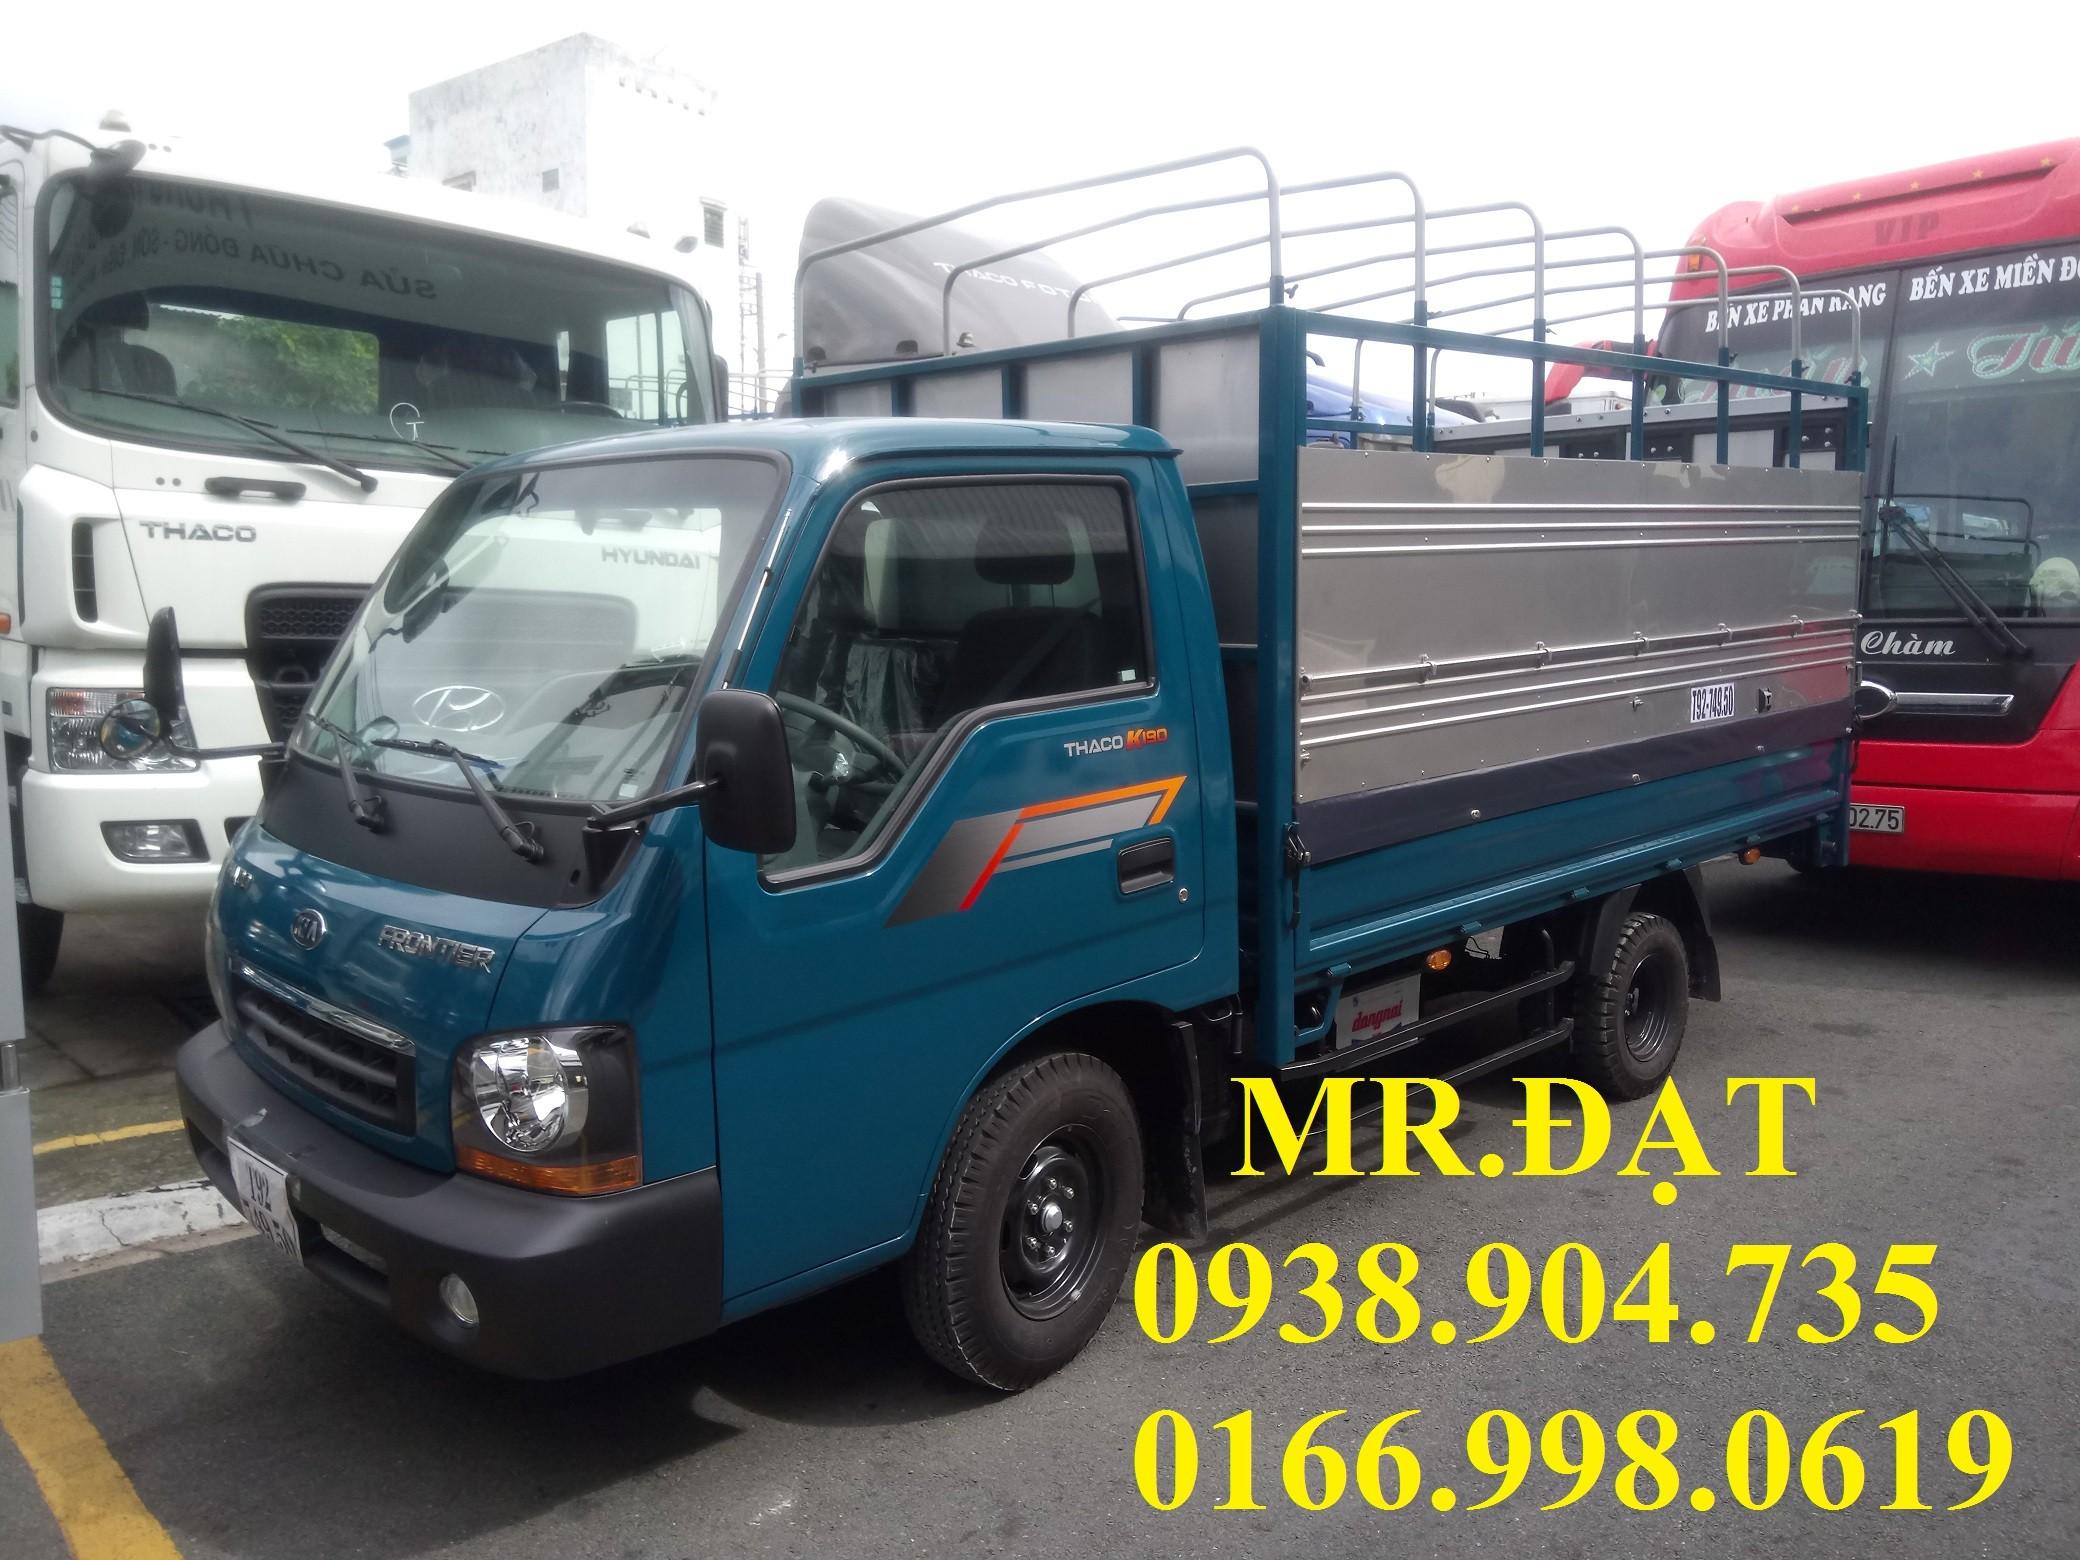 Xe tải kia 2400 KG, xe tải nhẹ Kia 2T4, xe tải Kia 2 tấn 4, xe tải Kia , Xe tải K165 2T4 Ảnh số 39631933